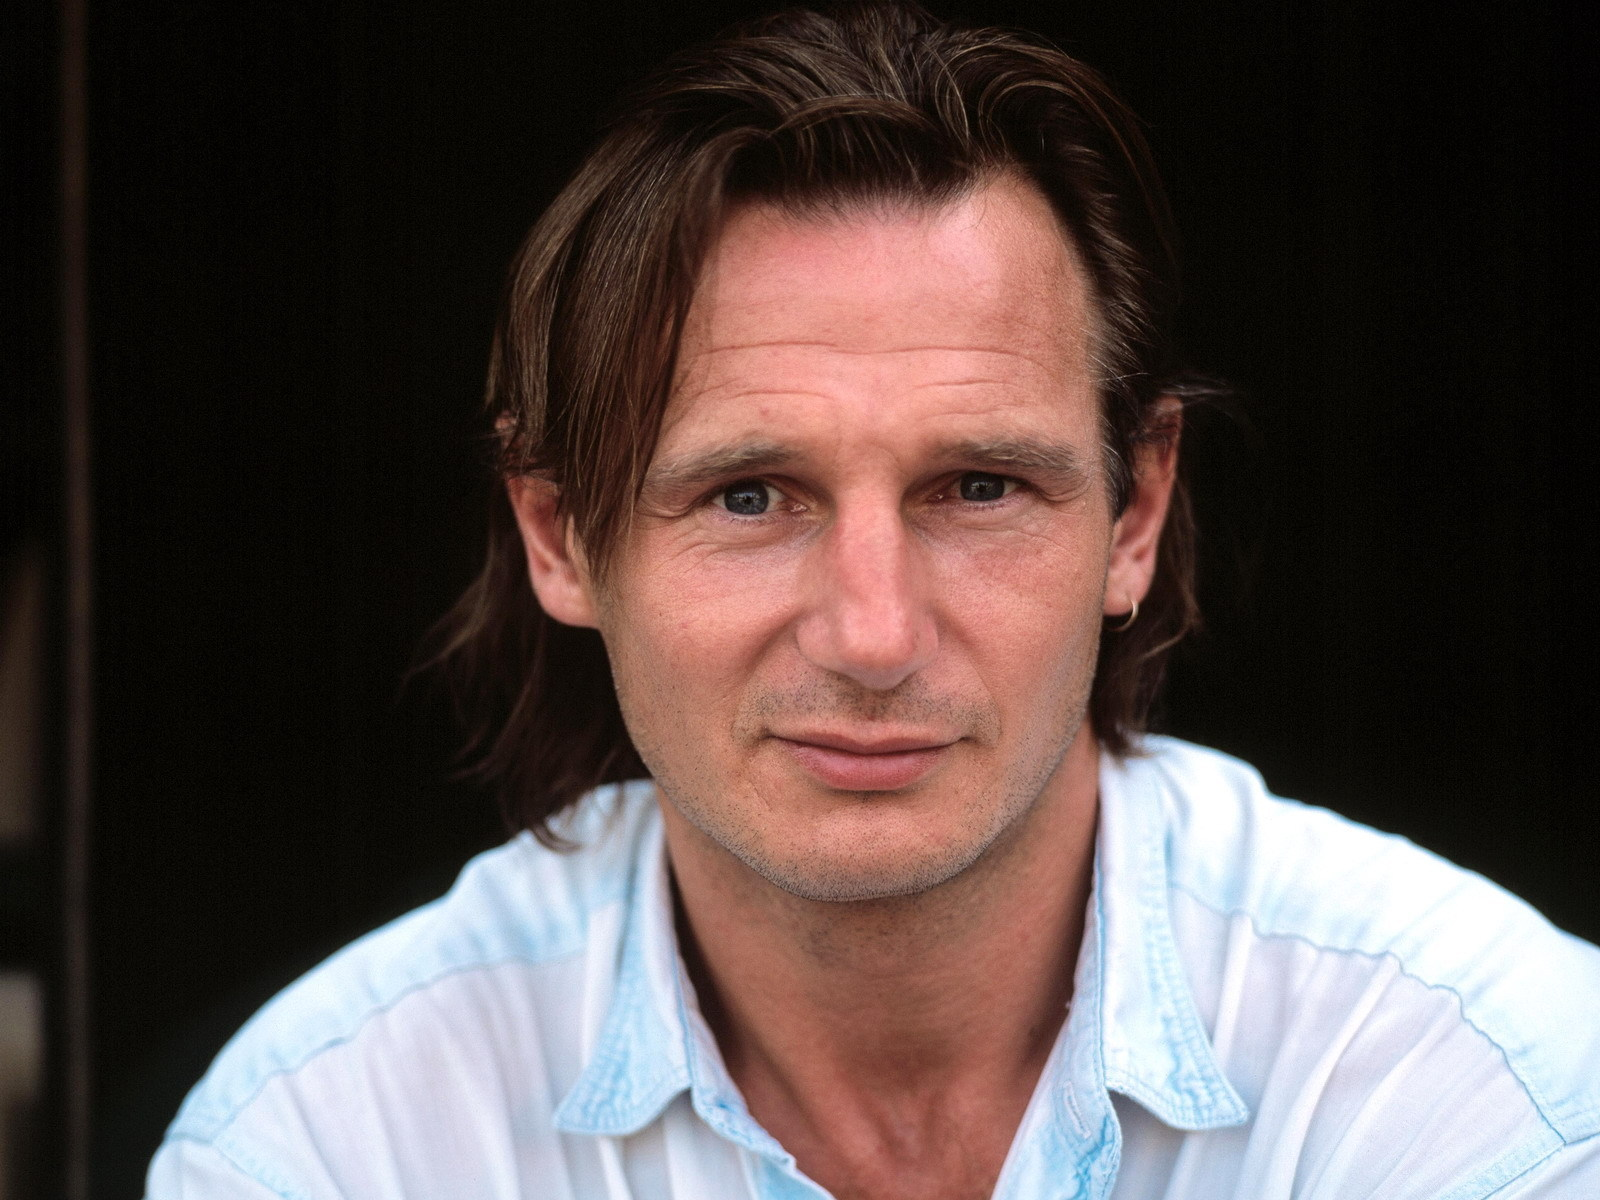 Liam Neeson Liam Neeson